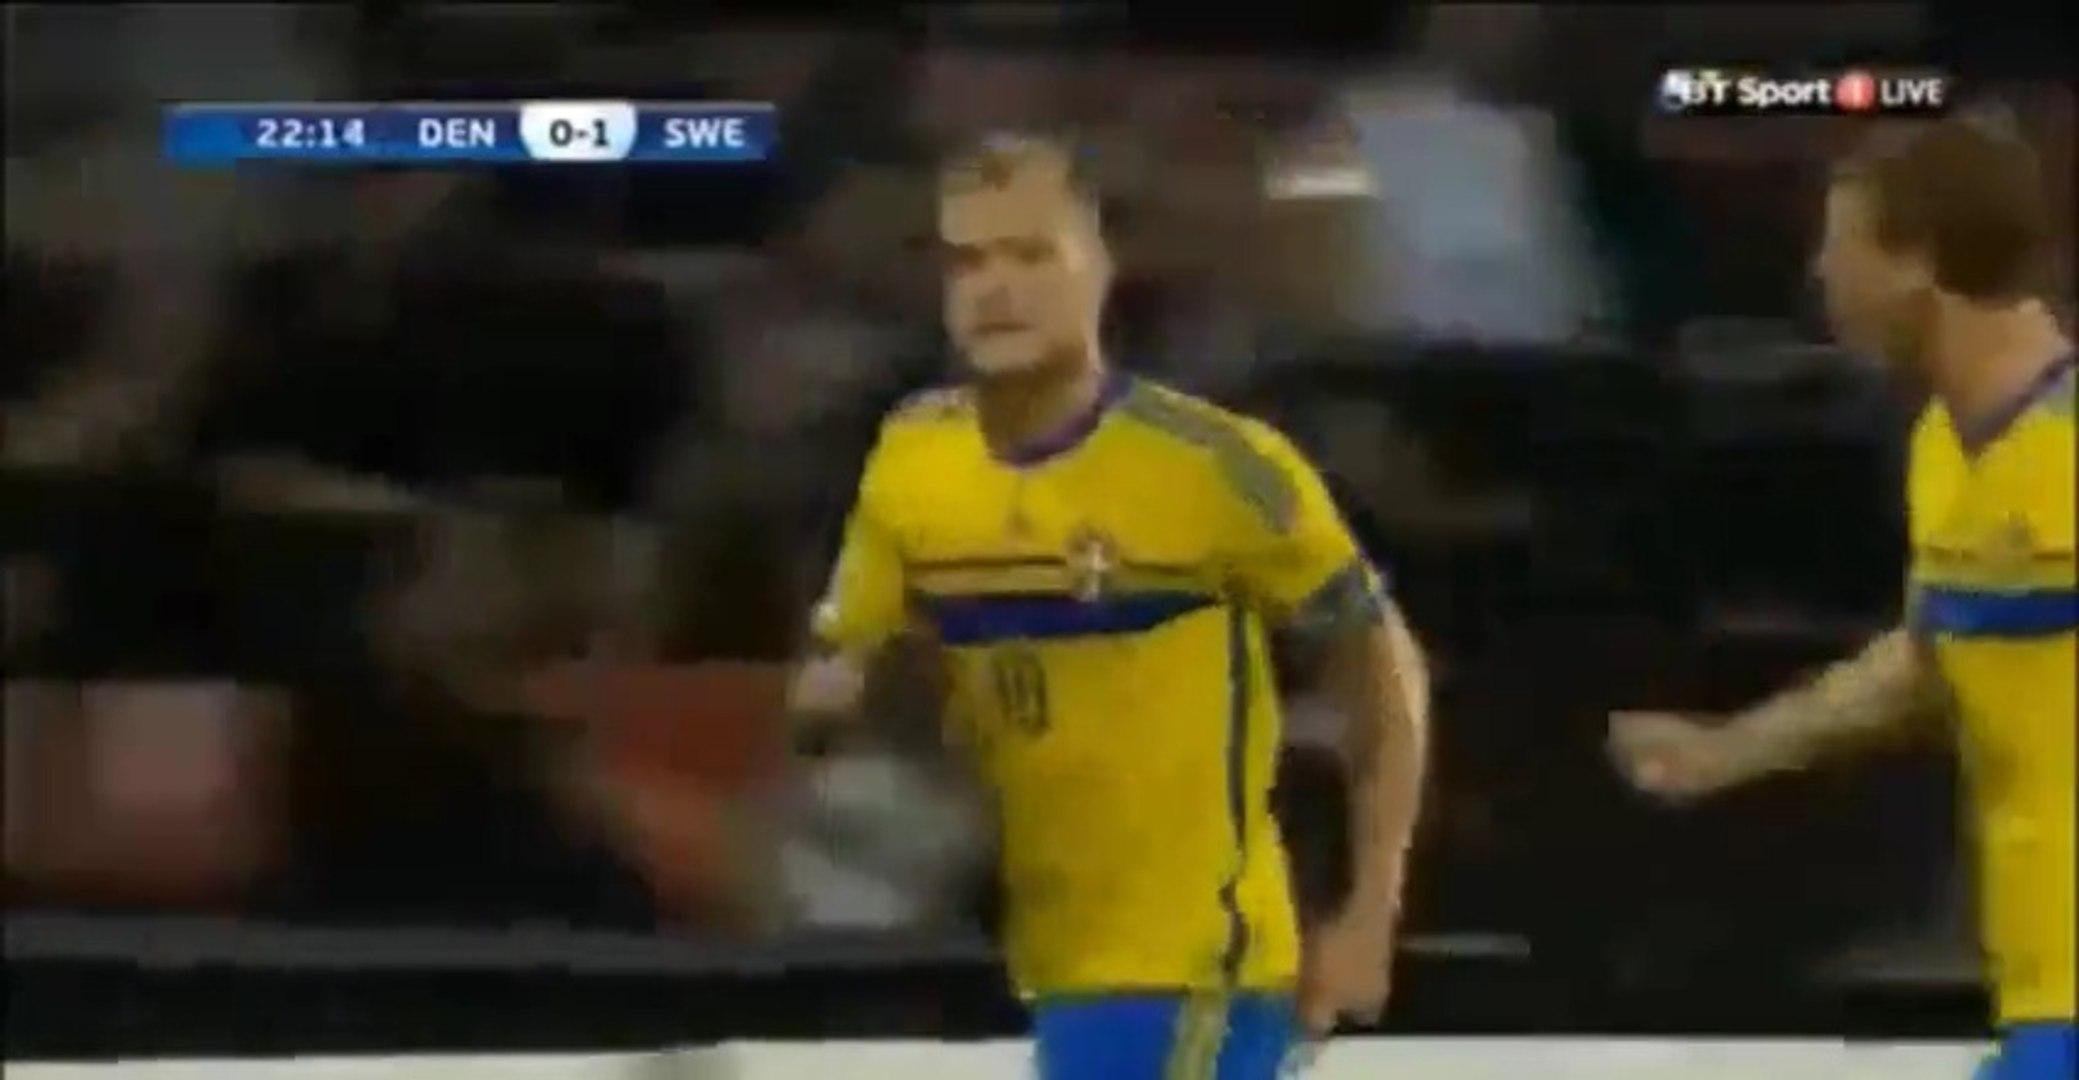 Denmark 1 - 4 Sweden All Goals Highlights 27.06.2015 (Euro U-21 Championship)